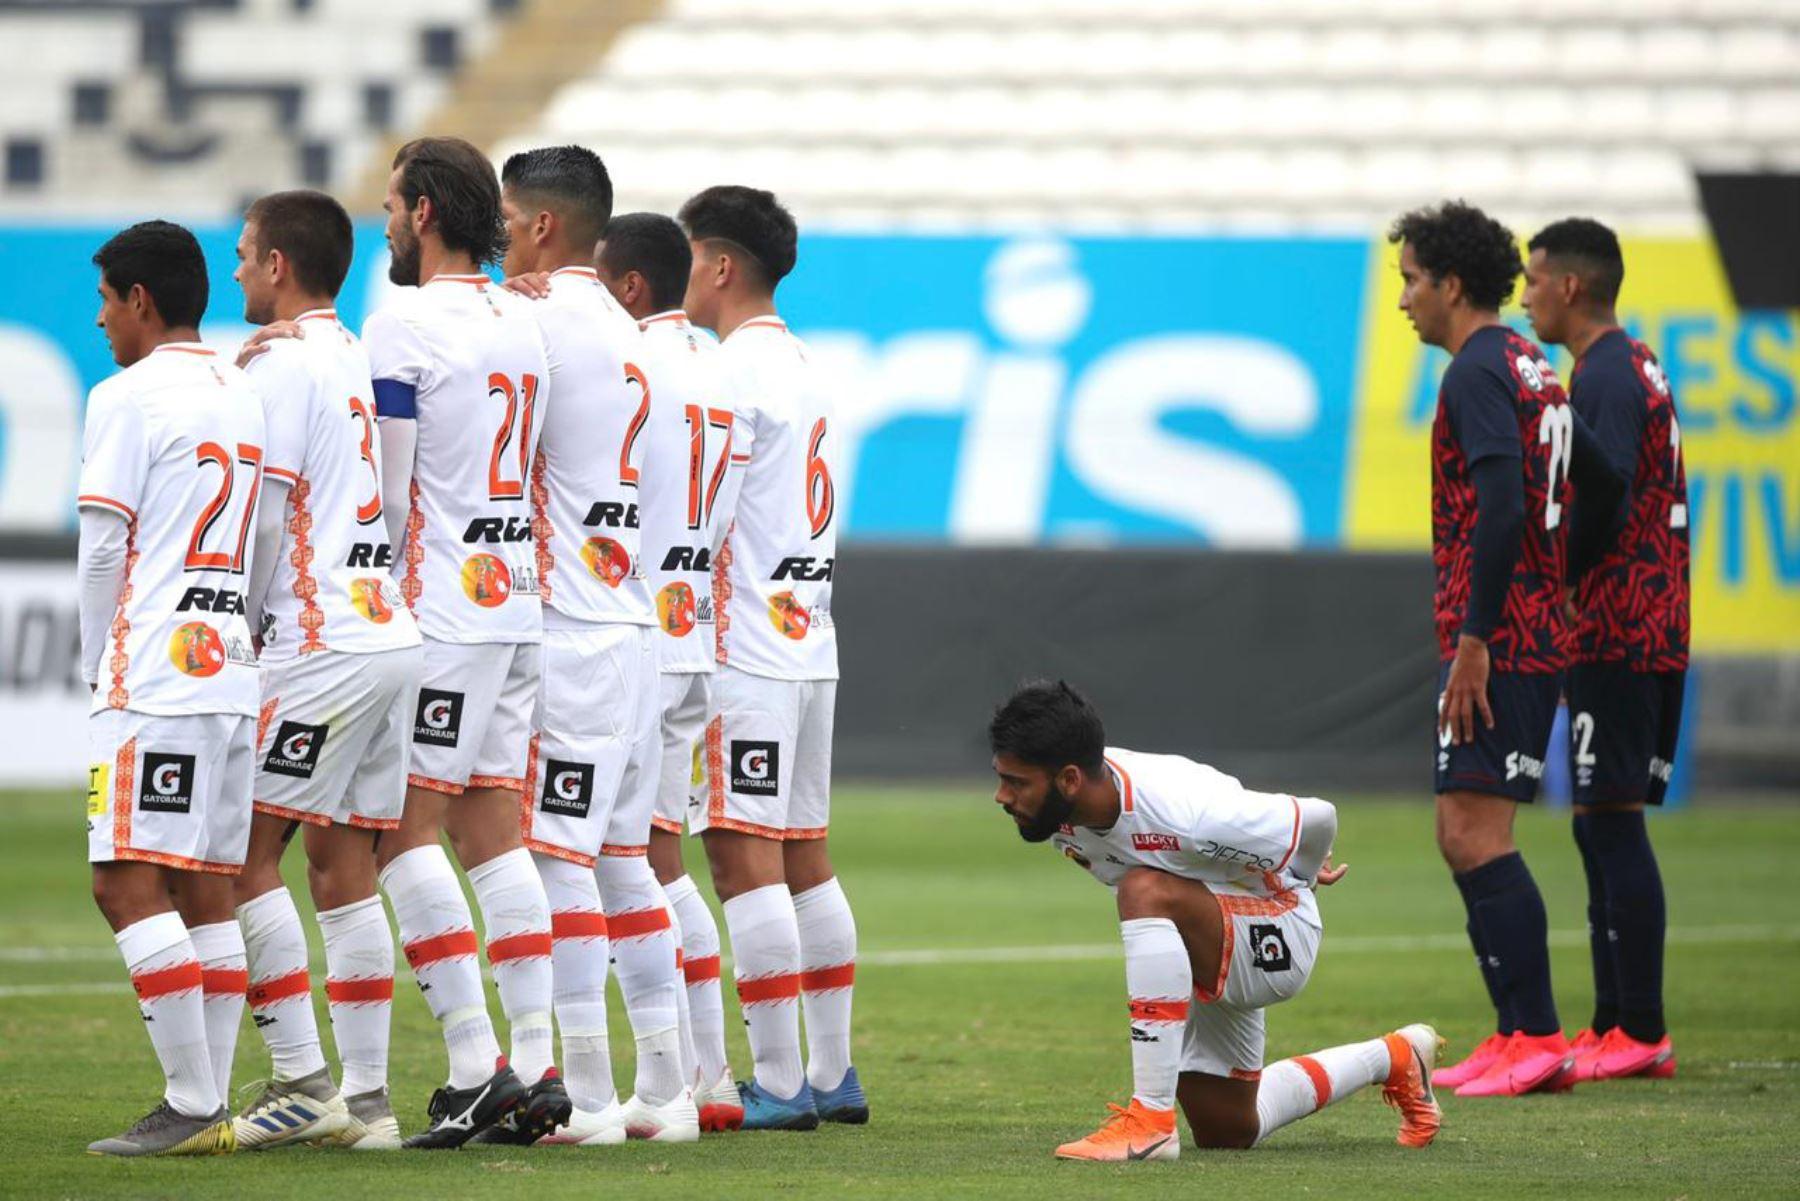 El futbolista Leandro Sosa asegura la barrera de  Ayacucho FC previo al tiro libre de Deportivo Municipal por la jornada 11 de la Liga 1, en el estadio Alejandro Villanueva. Foto: @LigaFutProf